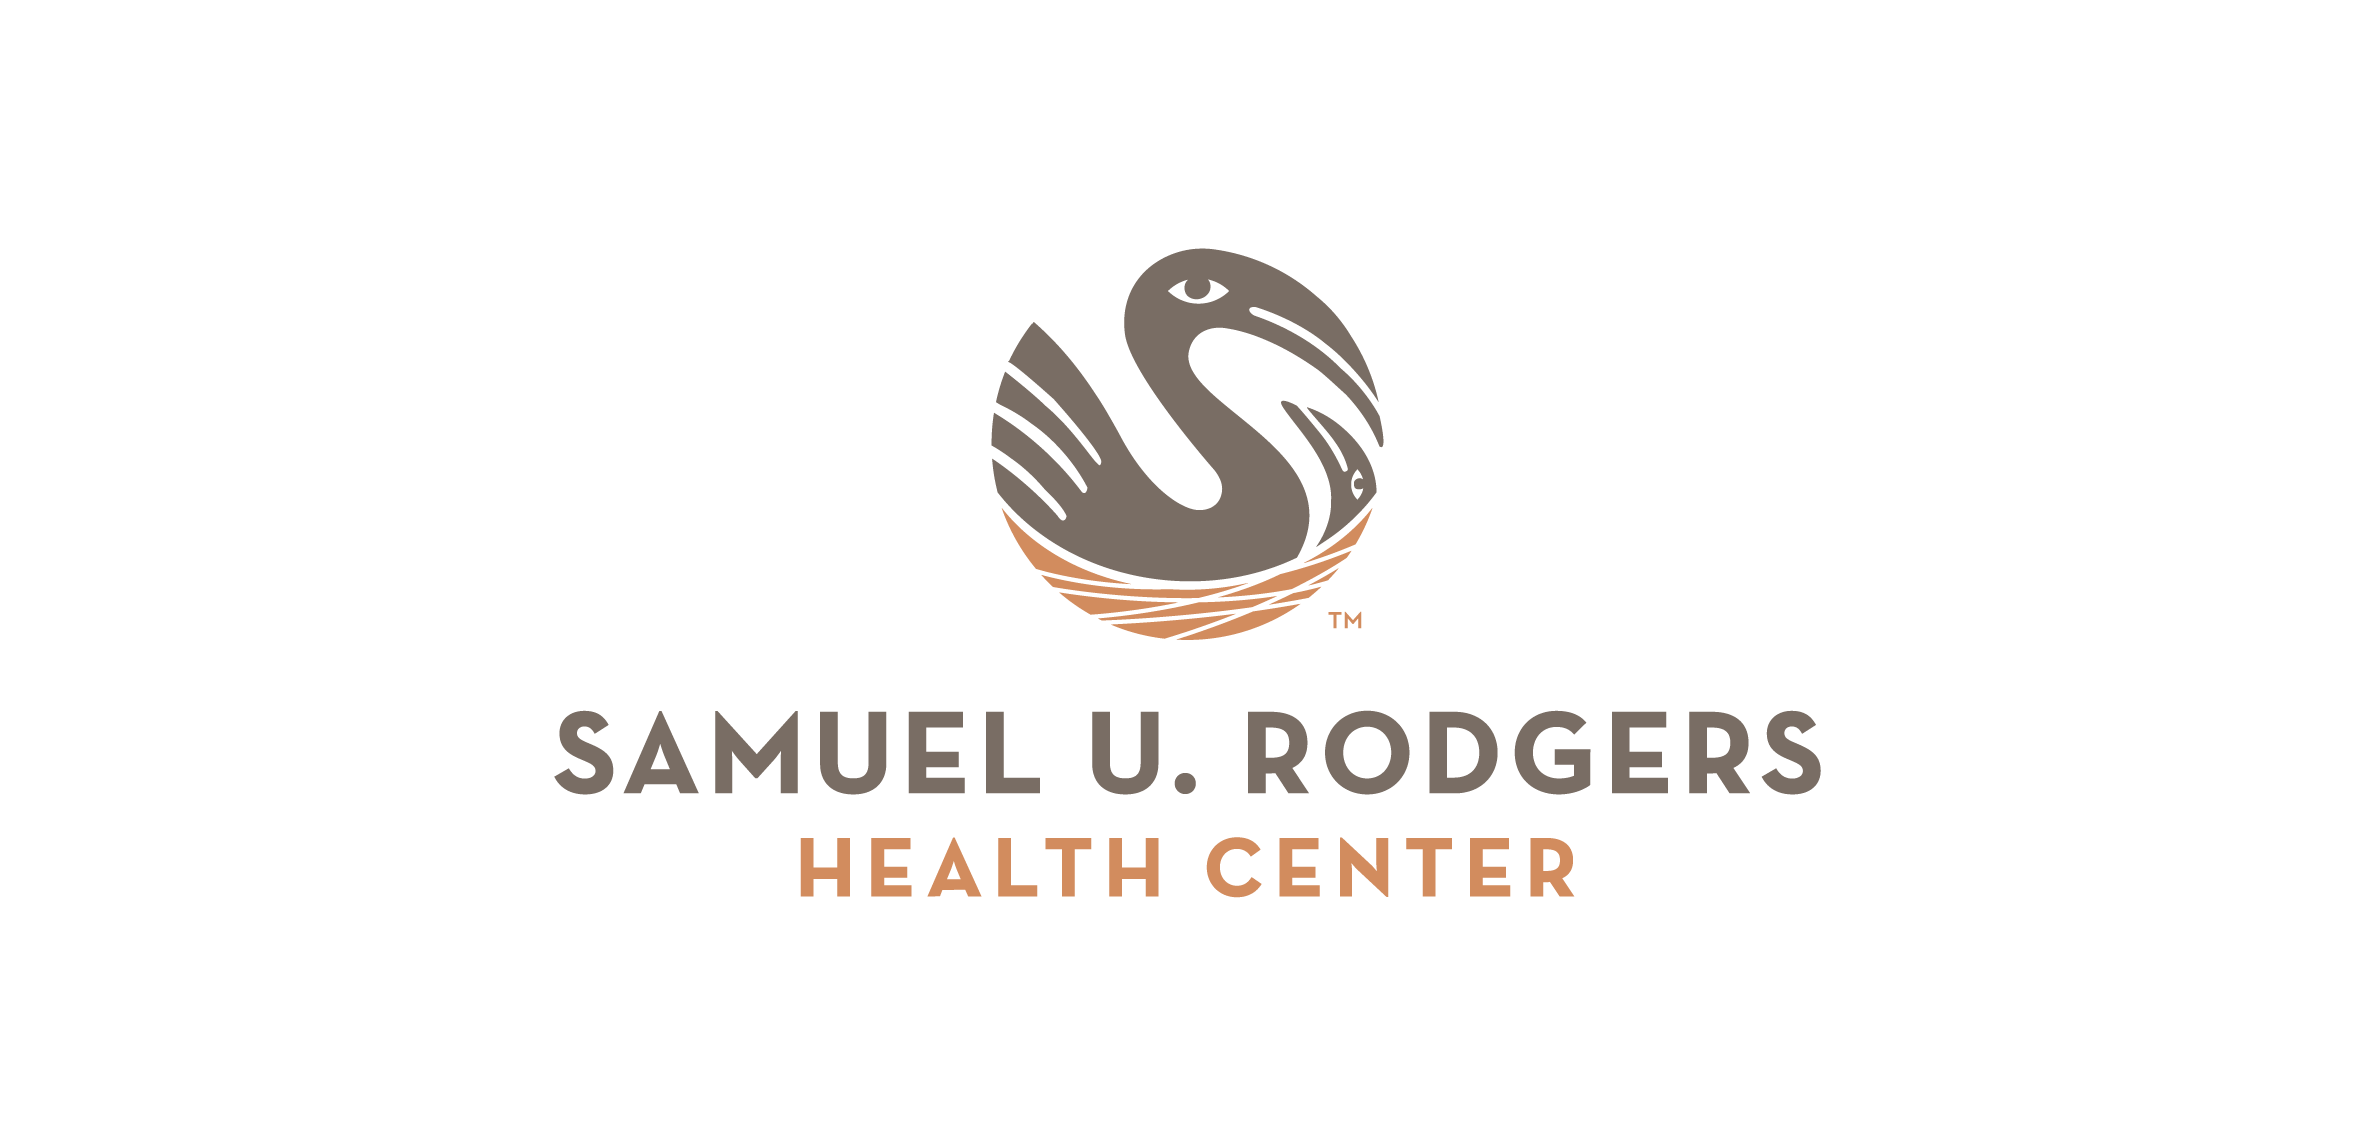 Sam Rodgers 健康中心环境视觉系统设计©Willoughby Design